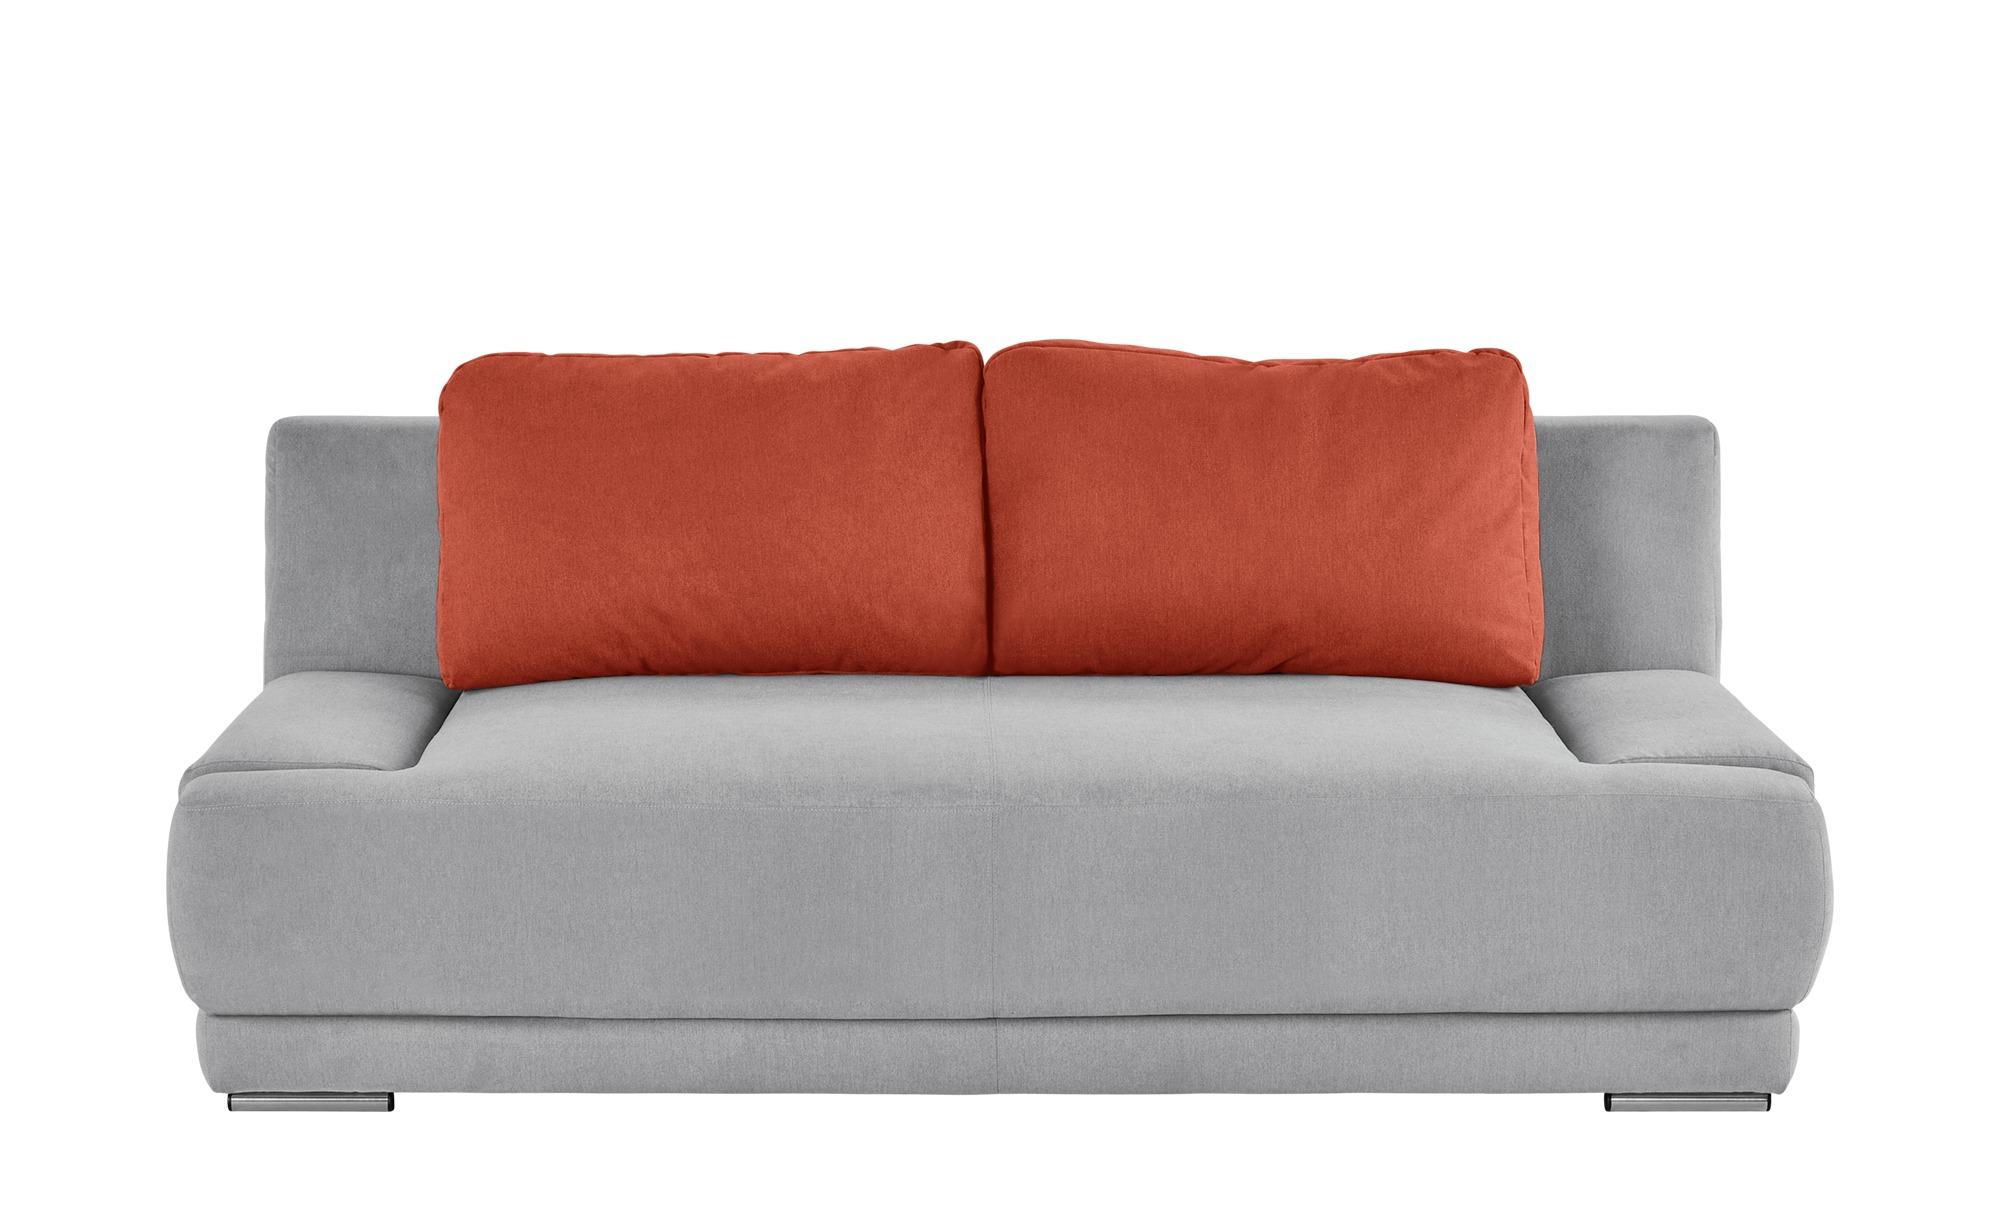 smart Schlafsofa grau/orange - Flachgewebe Regina ¦ grau ¦ Maße (cm): B: 206 H: 83 T: 98 Polstermöbel > Sofas > 2-Sitzer - Höffner